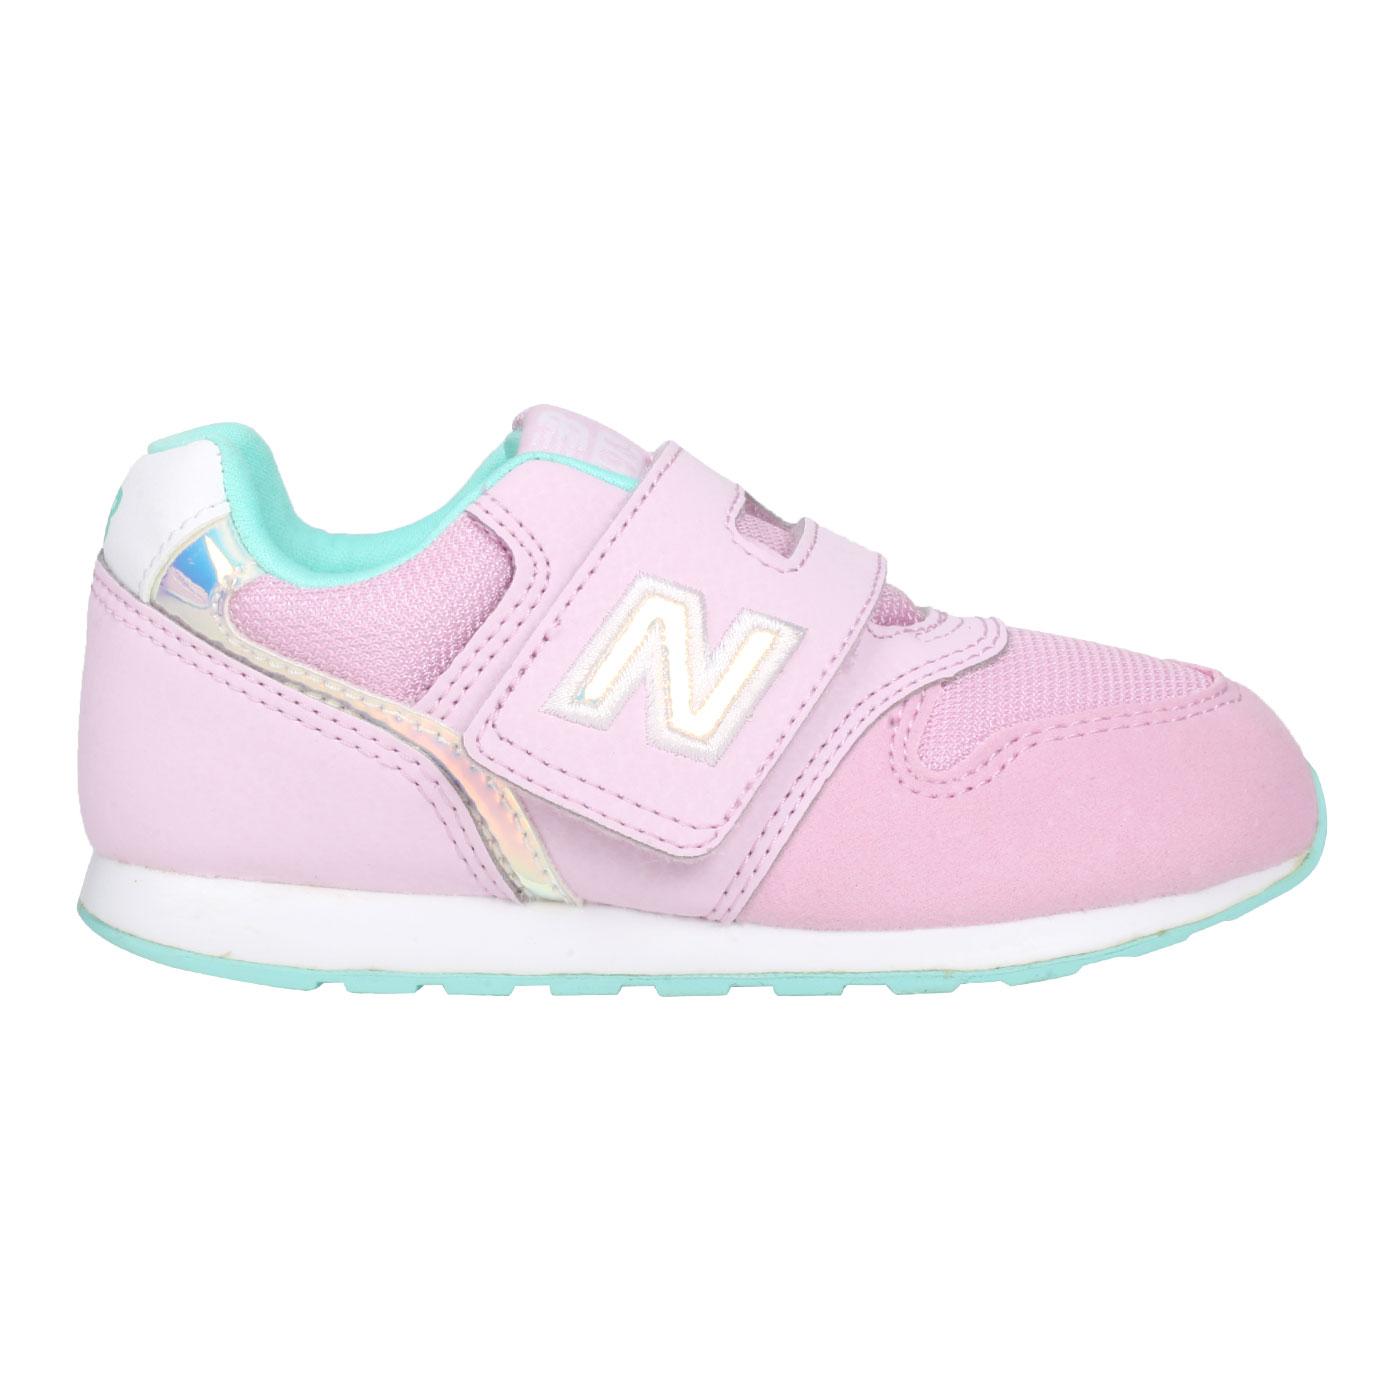 NEW BALANCE 小童運動休閒鞋-WIDE IZ996HPN